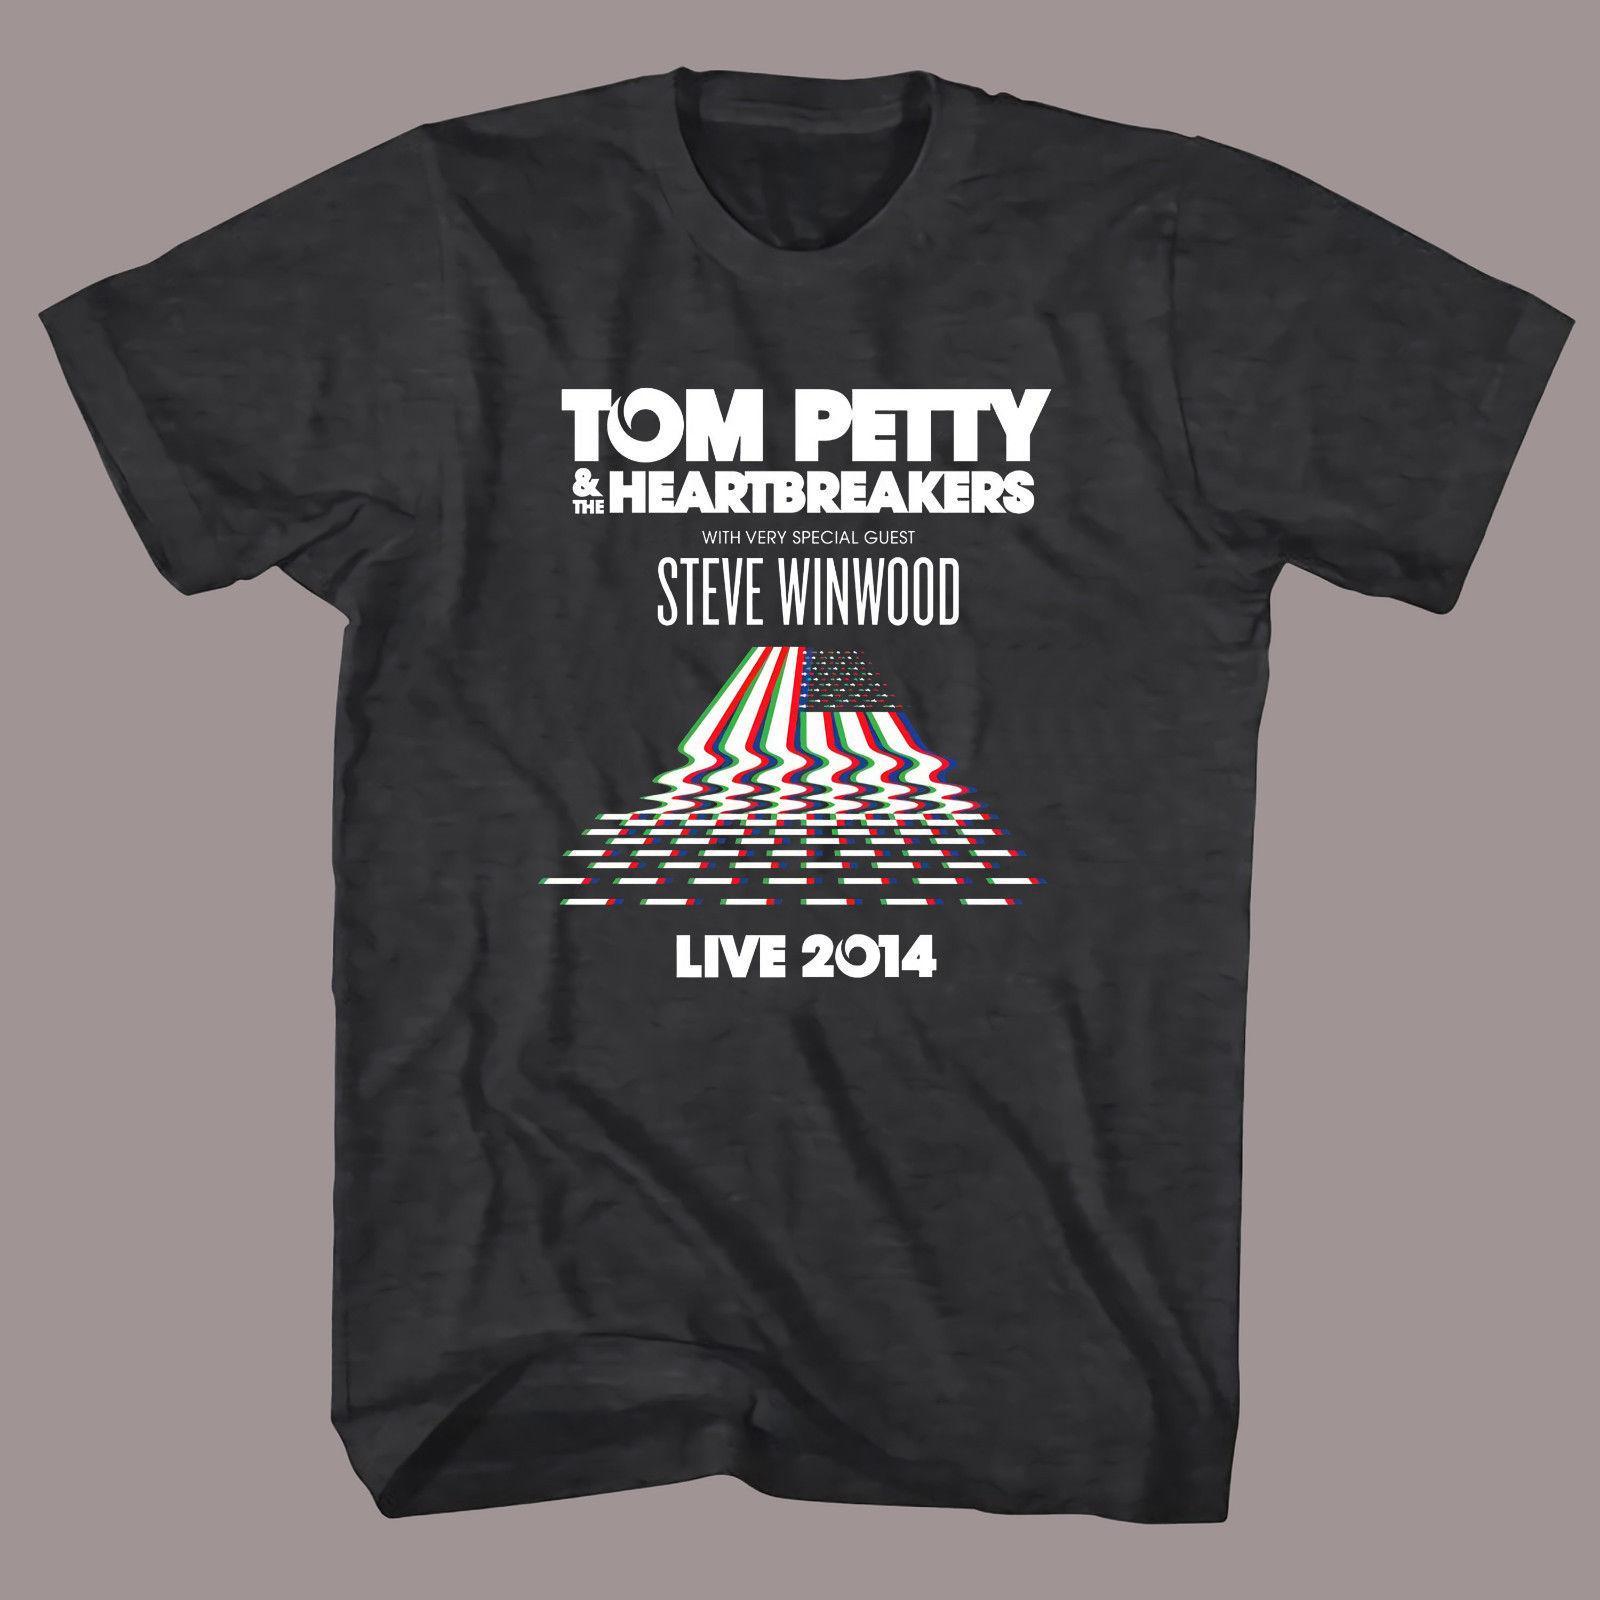 fbc3a7a9b ... THE HEARTBREAKERS Tour Logo Rock Band Men'S Black T Shirt Tee Shirt  Short Sleeve Plus Size T Shirt Colour Jersey Print T Shirt Very Funny T  Shirts Witty ...